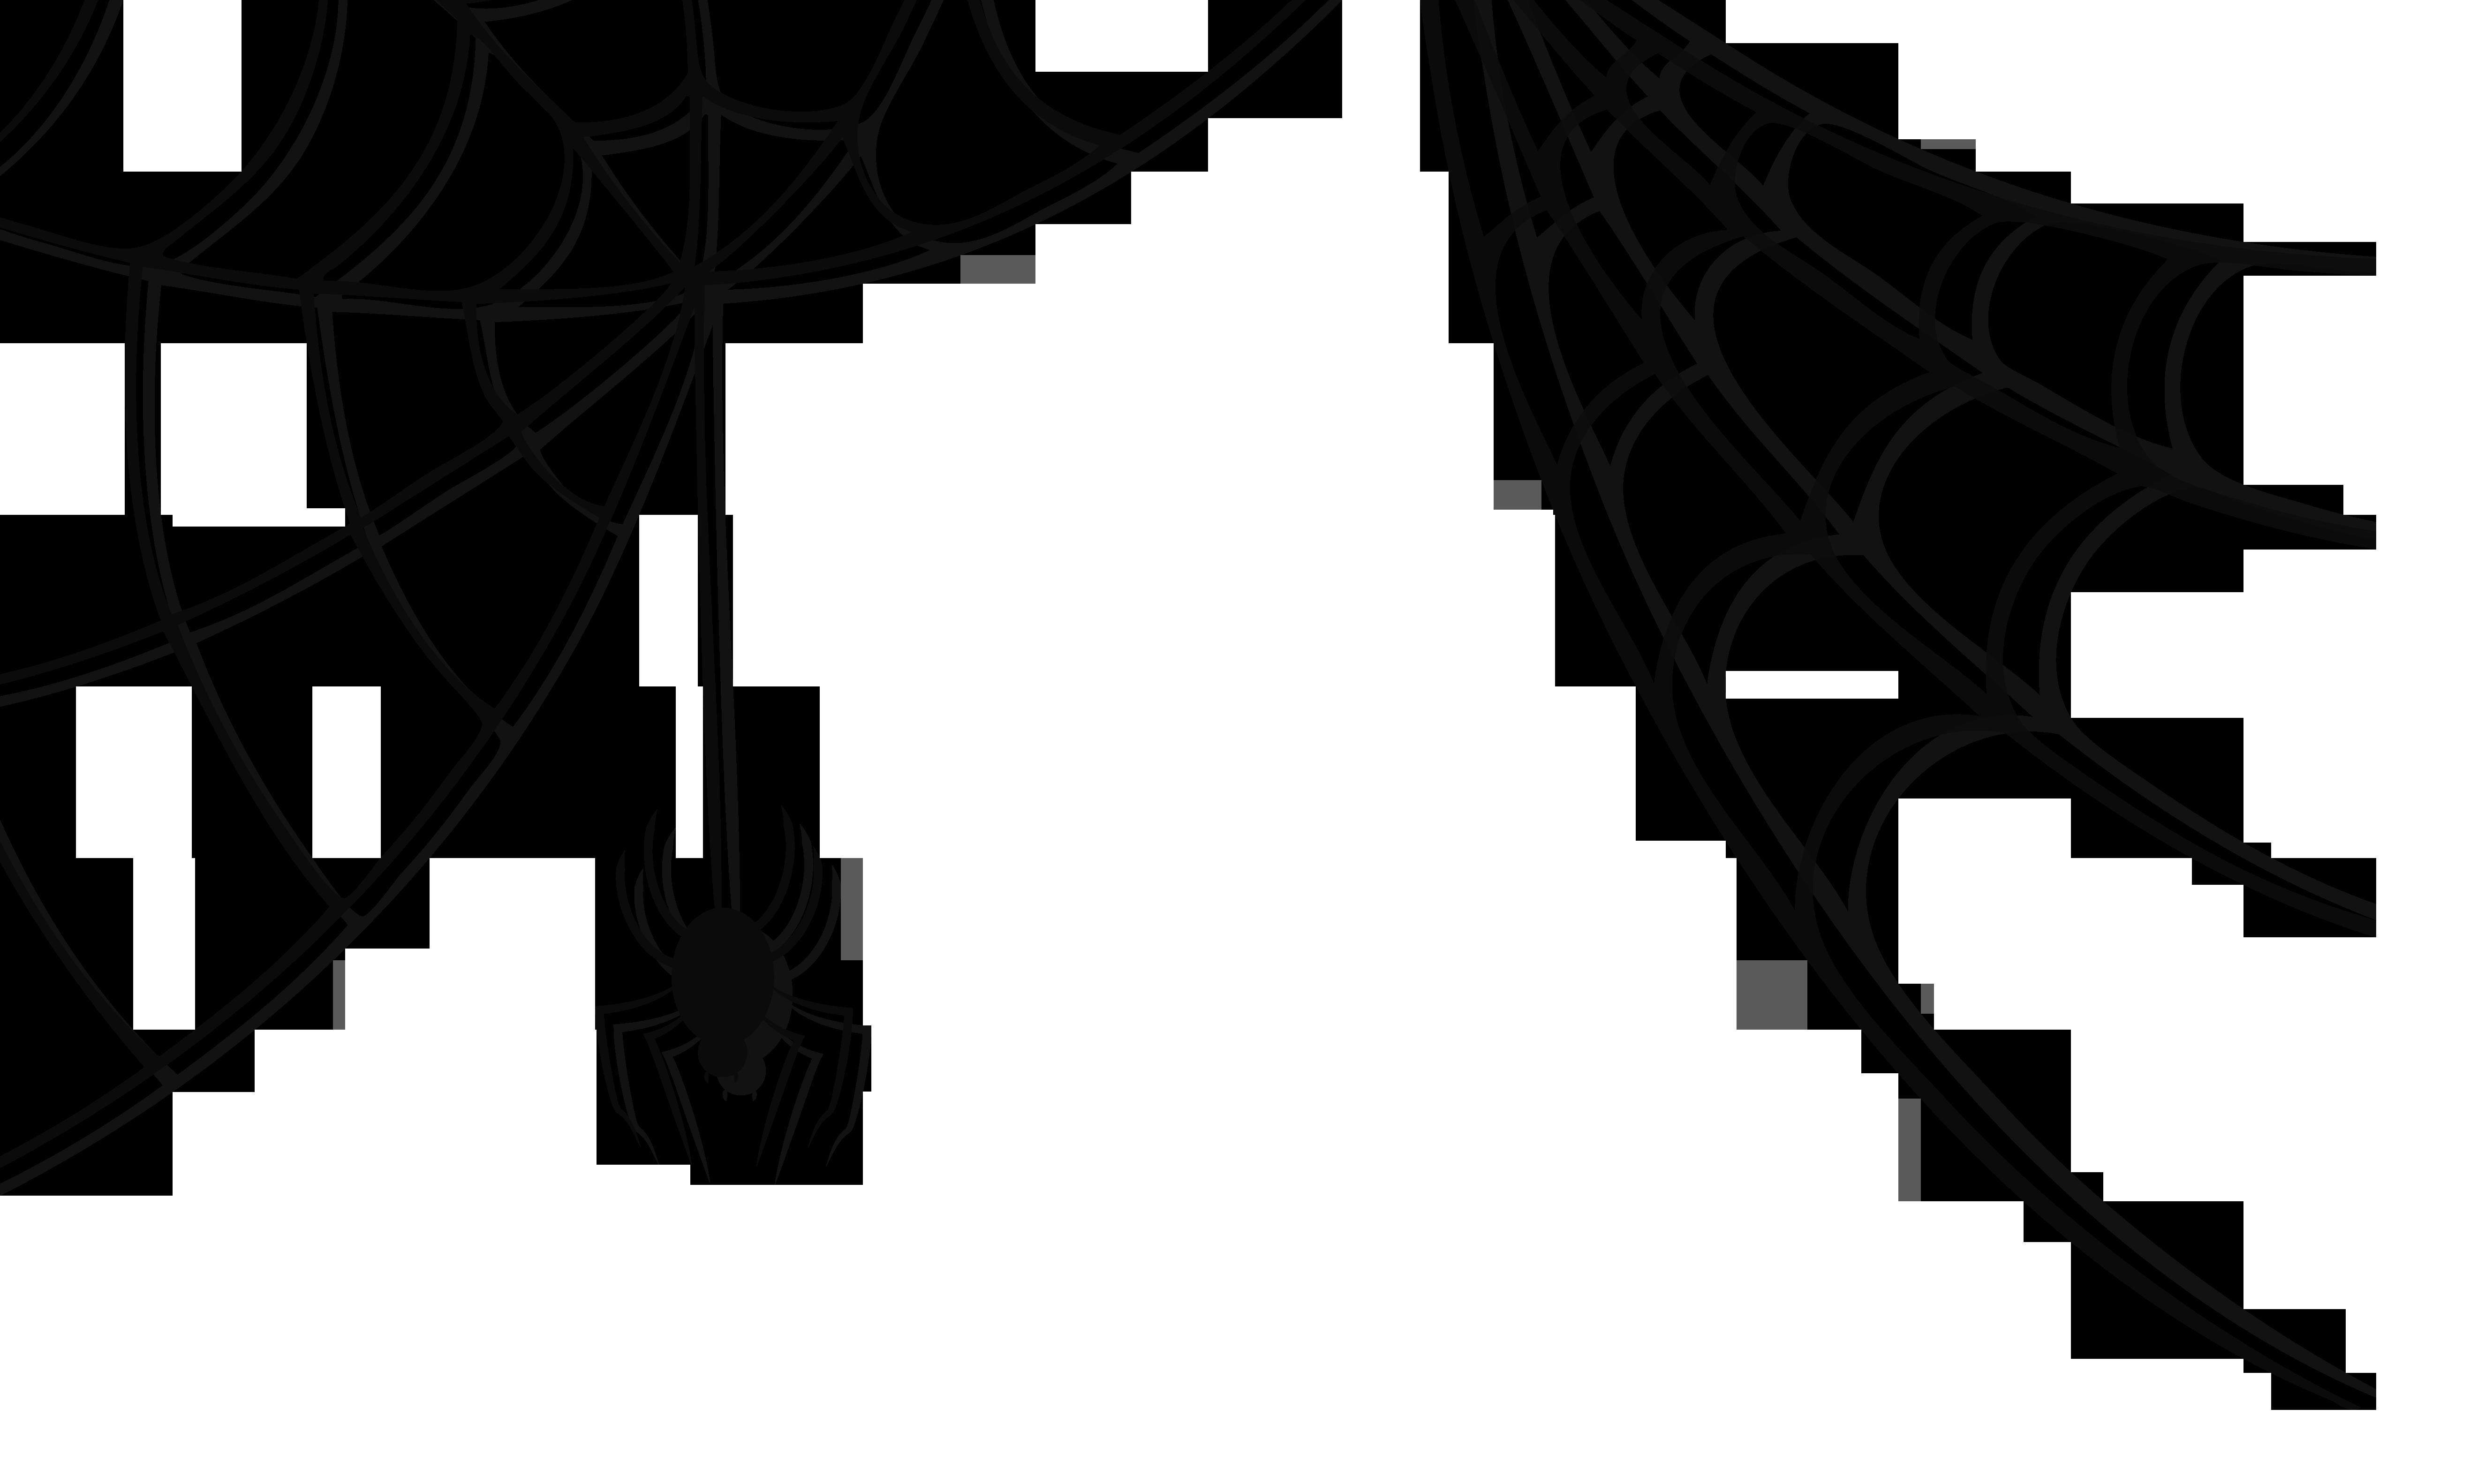 Cobweb clipart free svg freeuse 80+ Spider Web Clip Art | ClipartLook svg freeuse